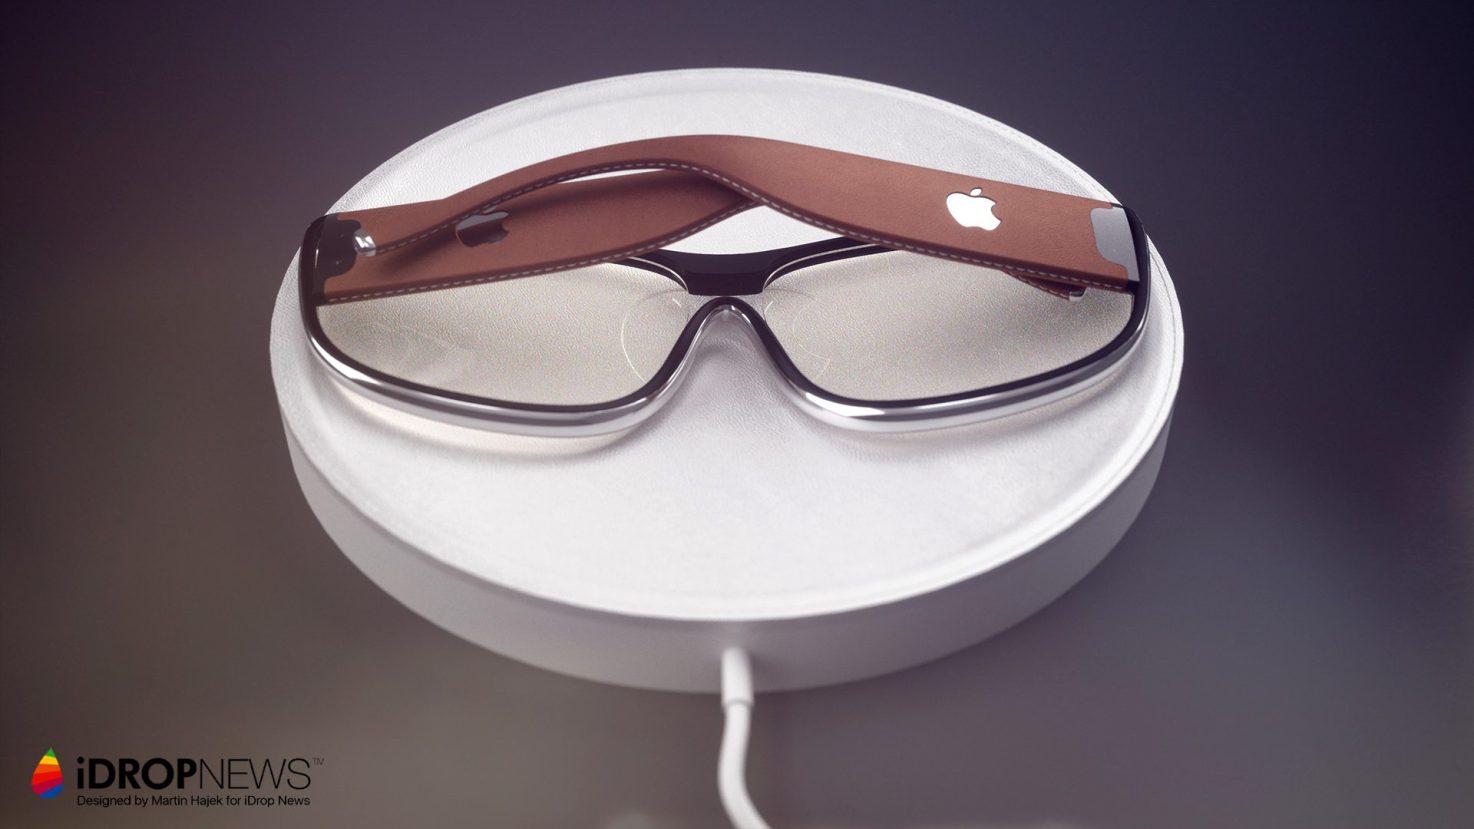 واقعیت افزوده اپل / عینک واقعیت افزوده / Apple AR